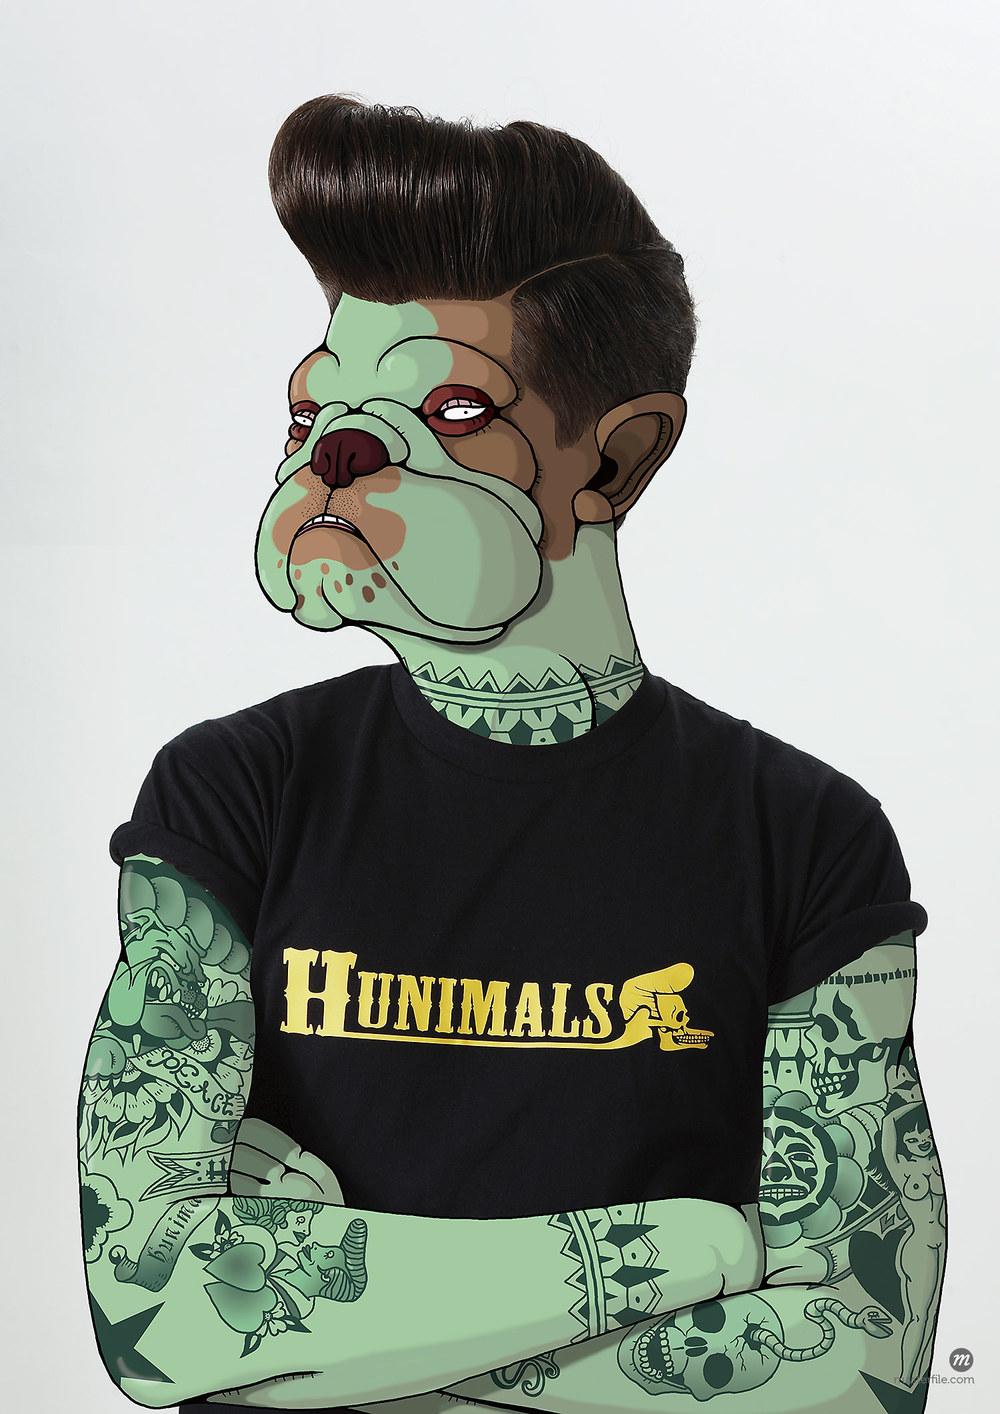 Man with tattoos and bulldog face © Ikon Images / Masterfile